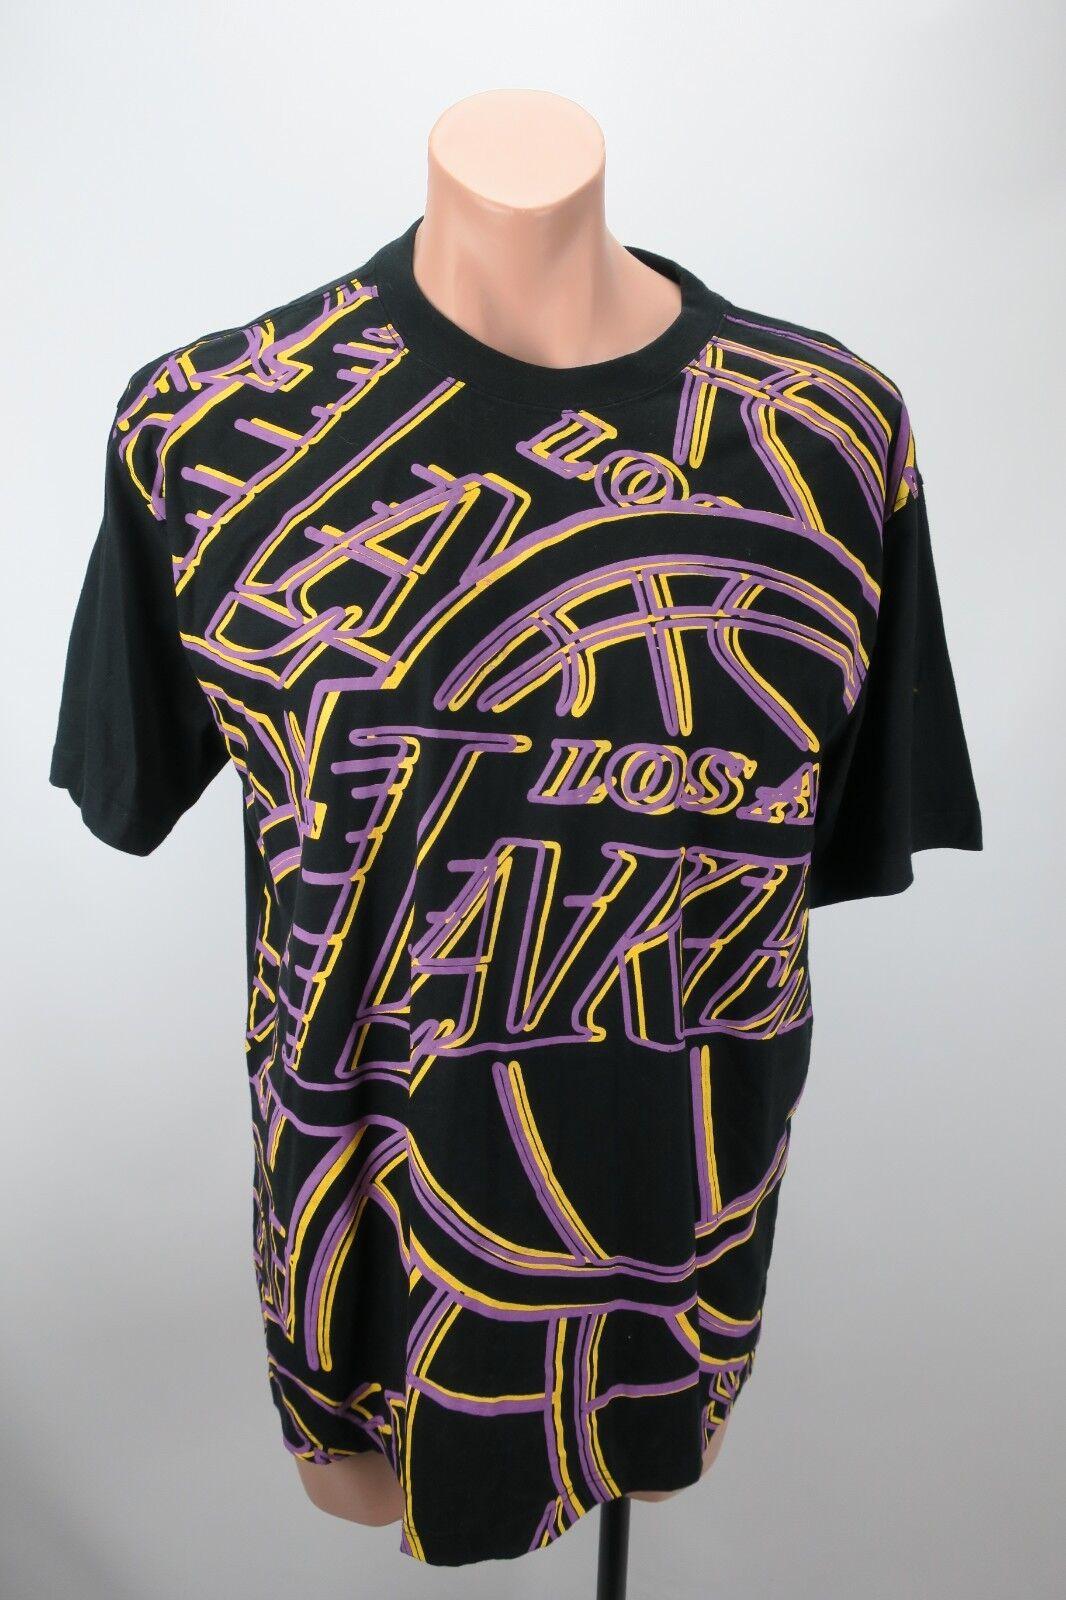 LA Lakers All Over Print Front NBA Lebron Basketball Shirt Sz XL UNK